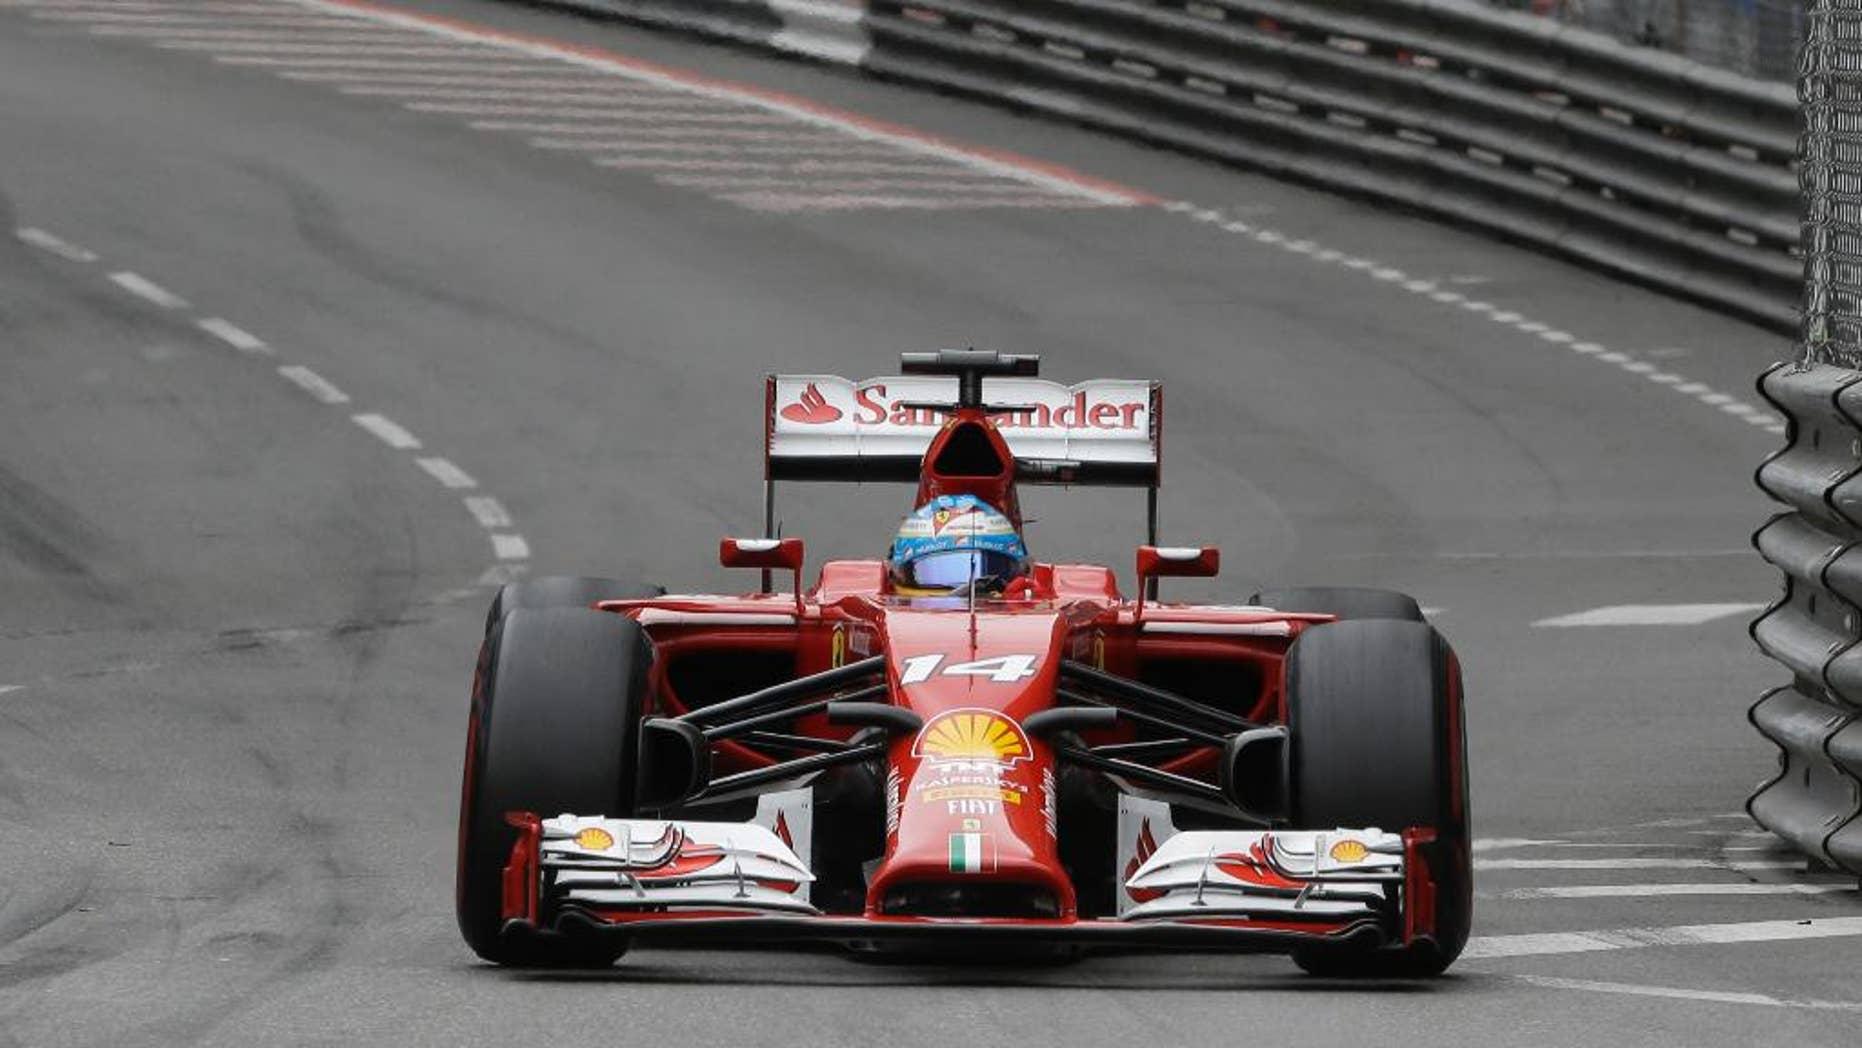 Ferrari driver Fernando Alonso of Spain steers his car during the Monaco Formula One Grand Prix, at the Monaco racetrack, in Monaco, Sunday, May 25, 2014. (AP Photo/Luca Bruno)